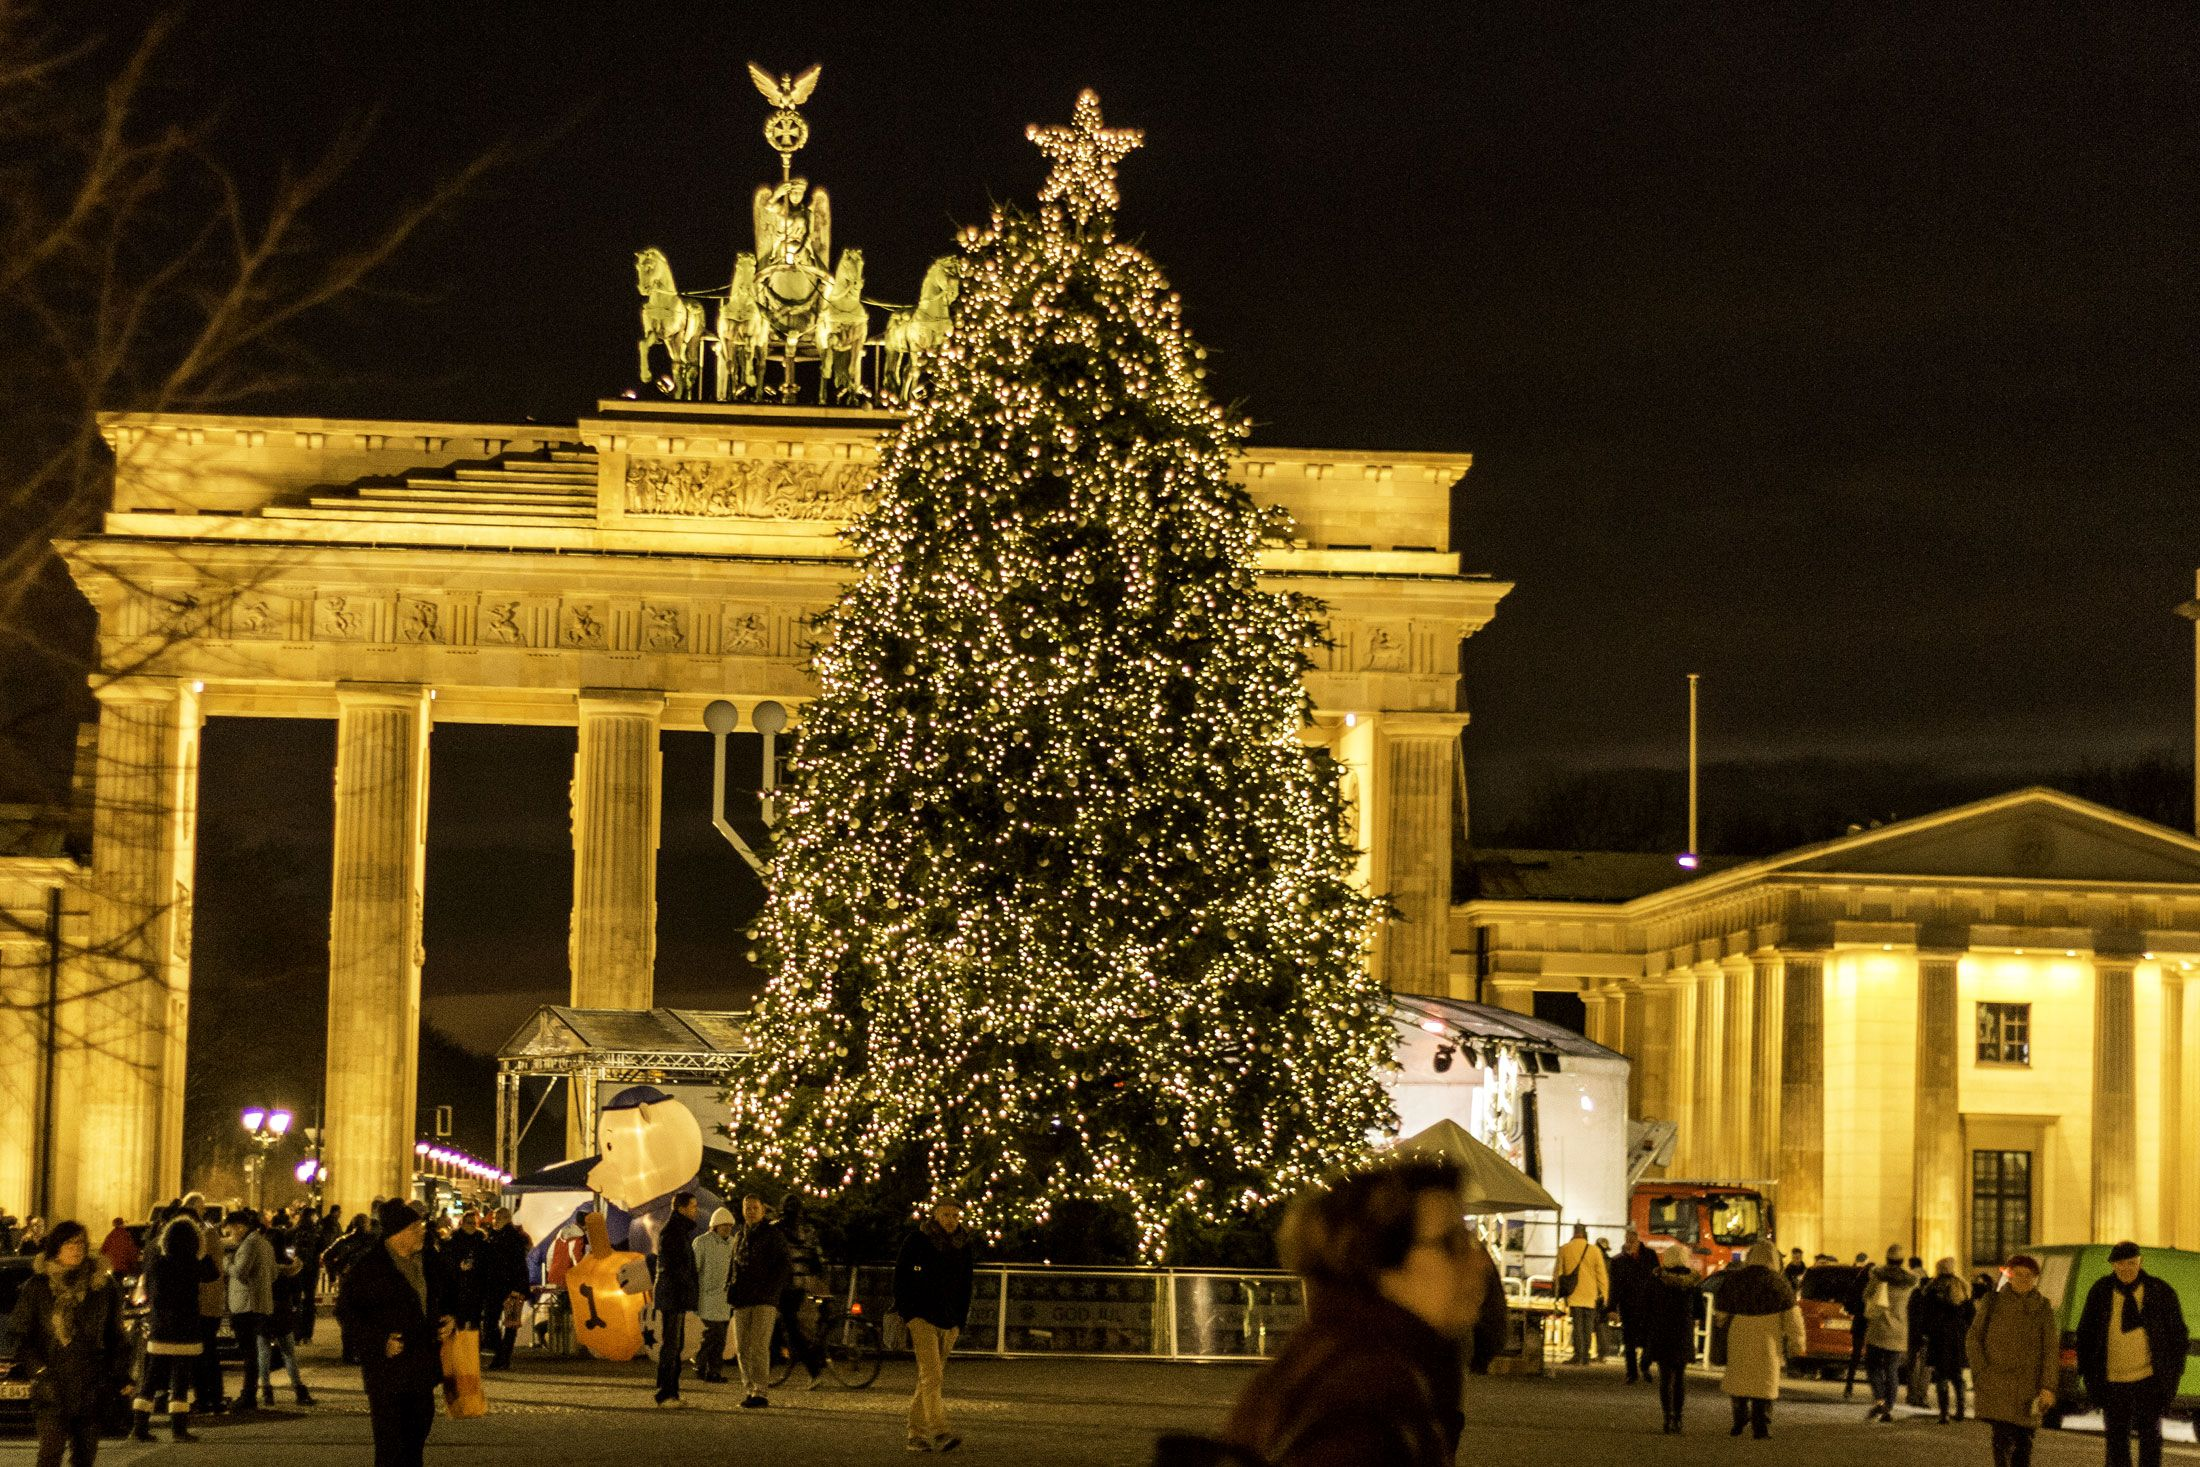 Berlin Brandenburger Tor Weihnachten Berlin Fotos Weihnachten Brandenburger Tor